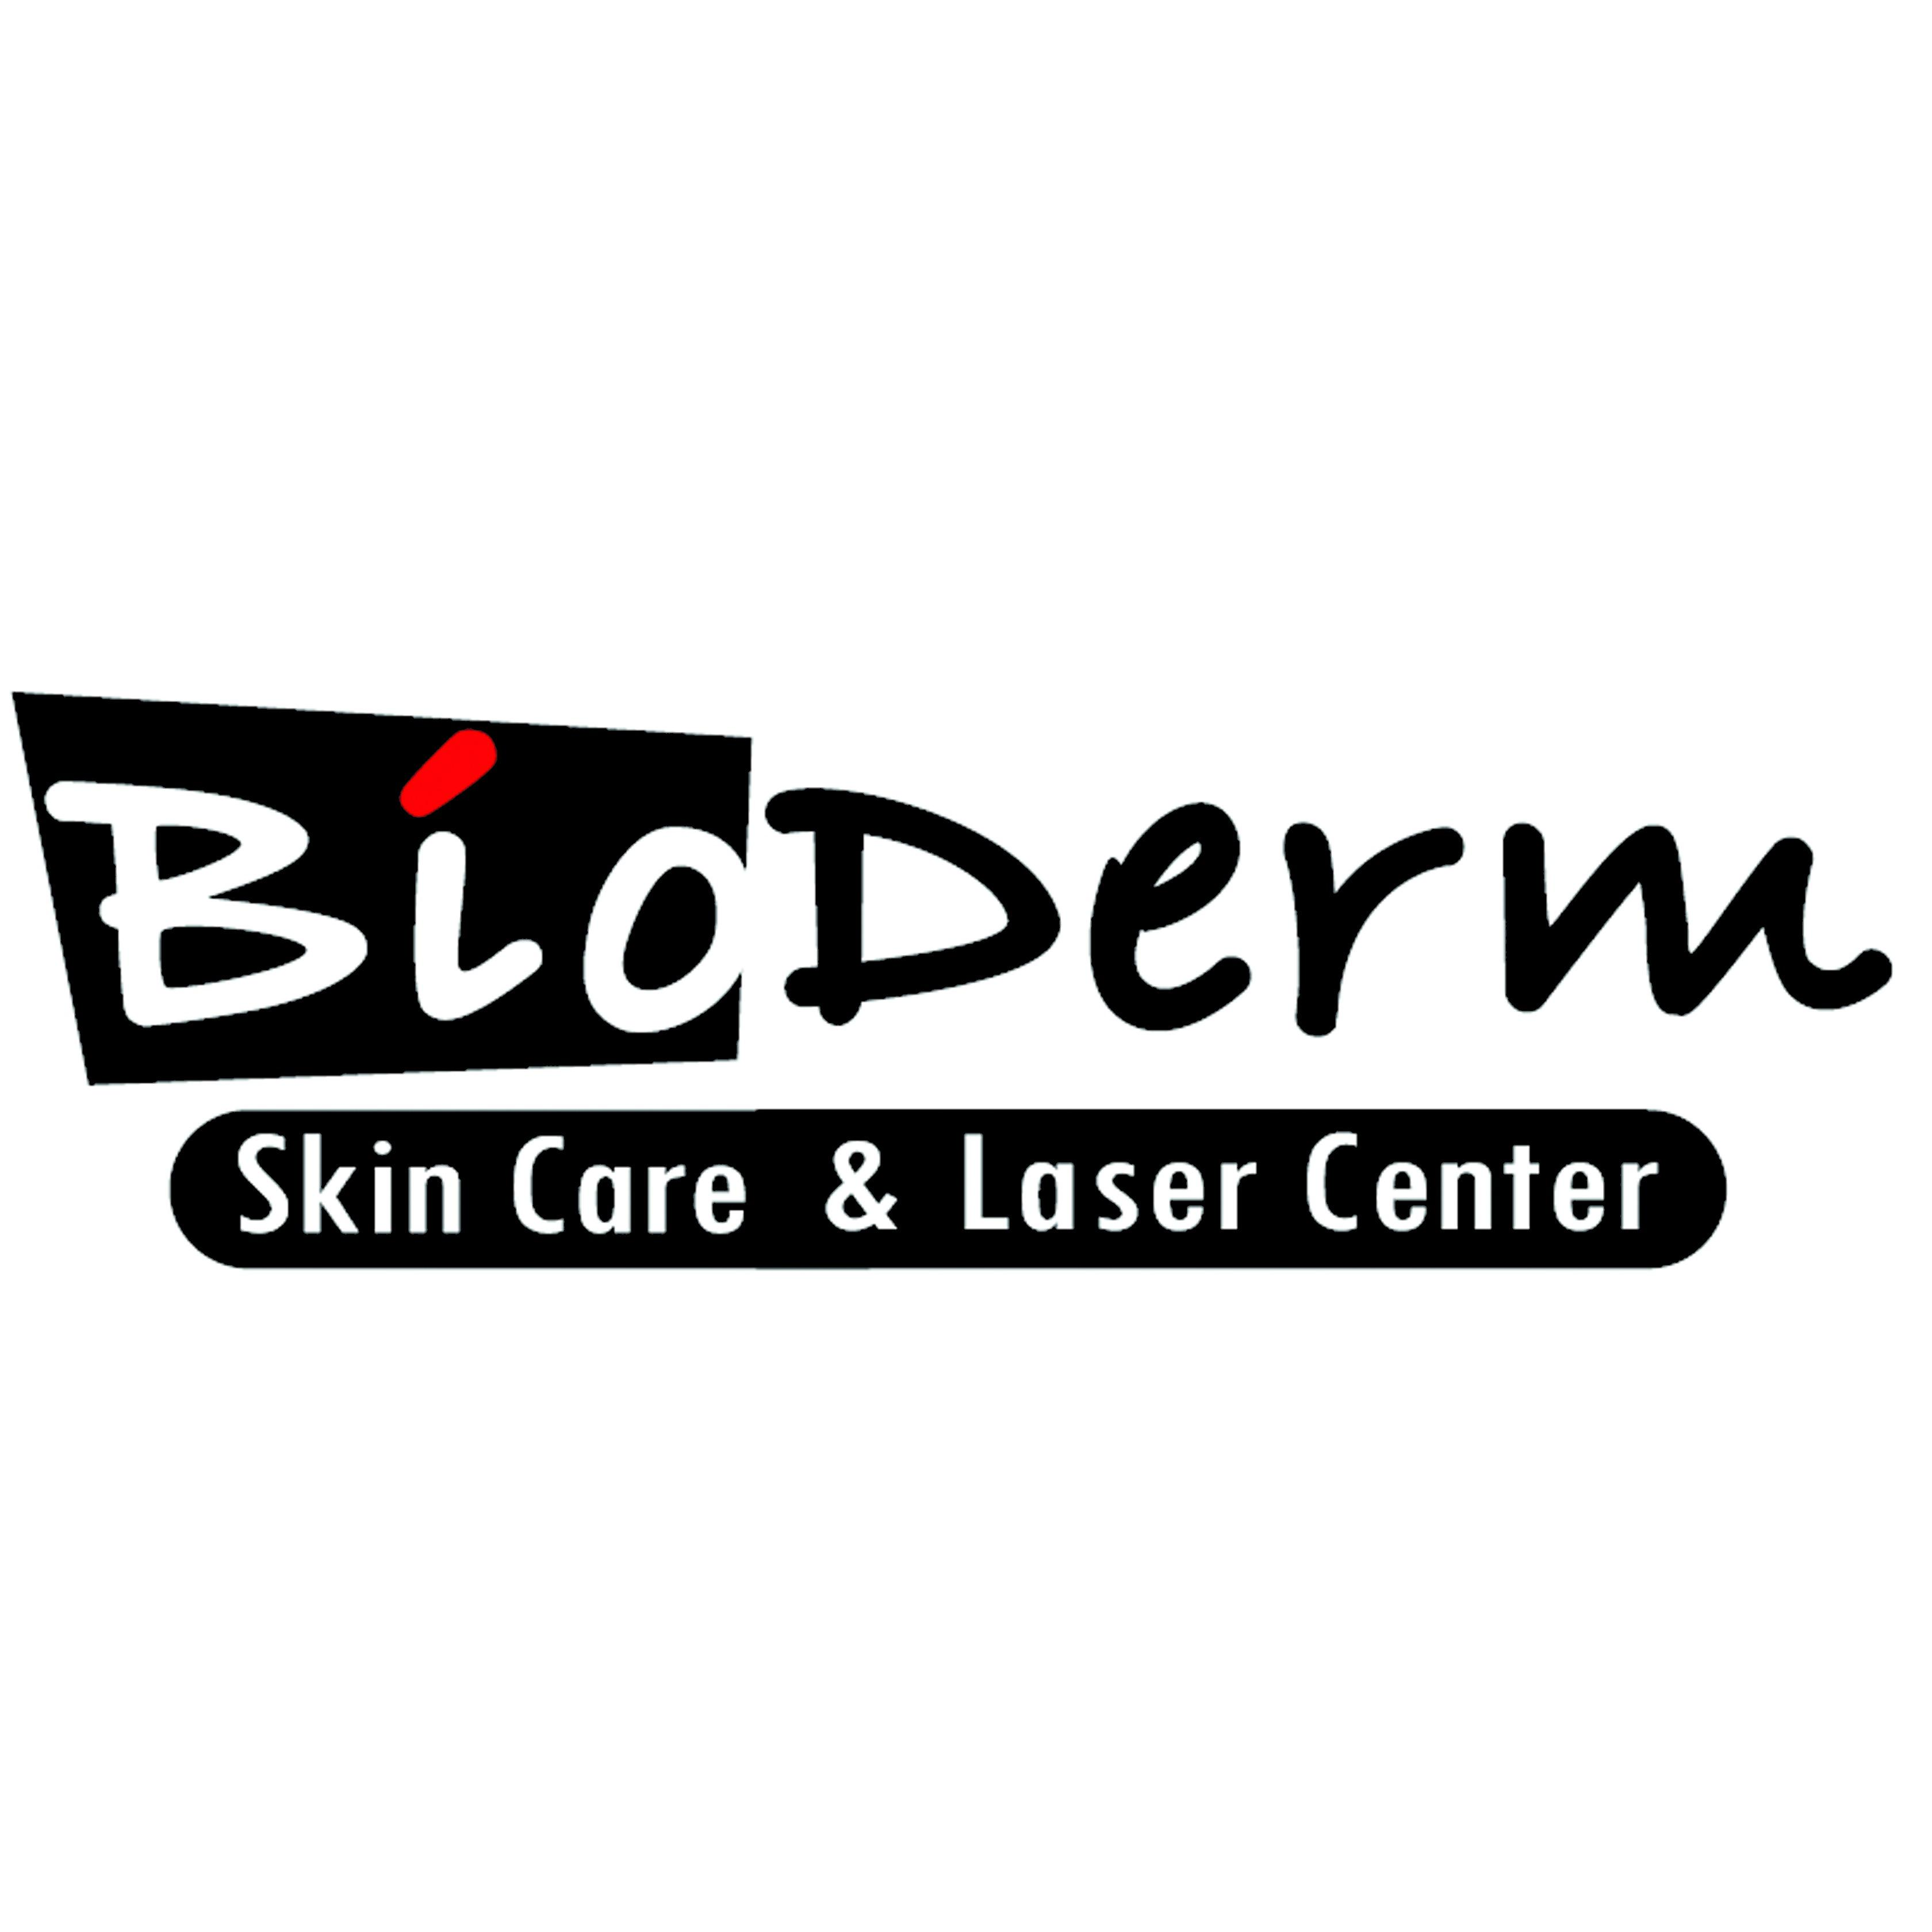 BioDerm Skincare & Laser Center